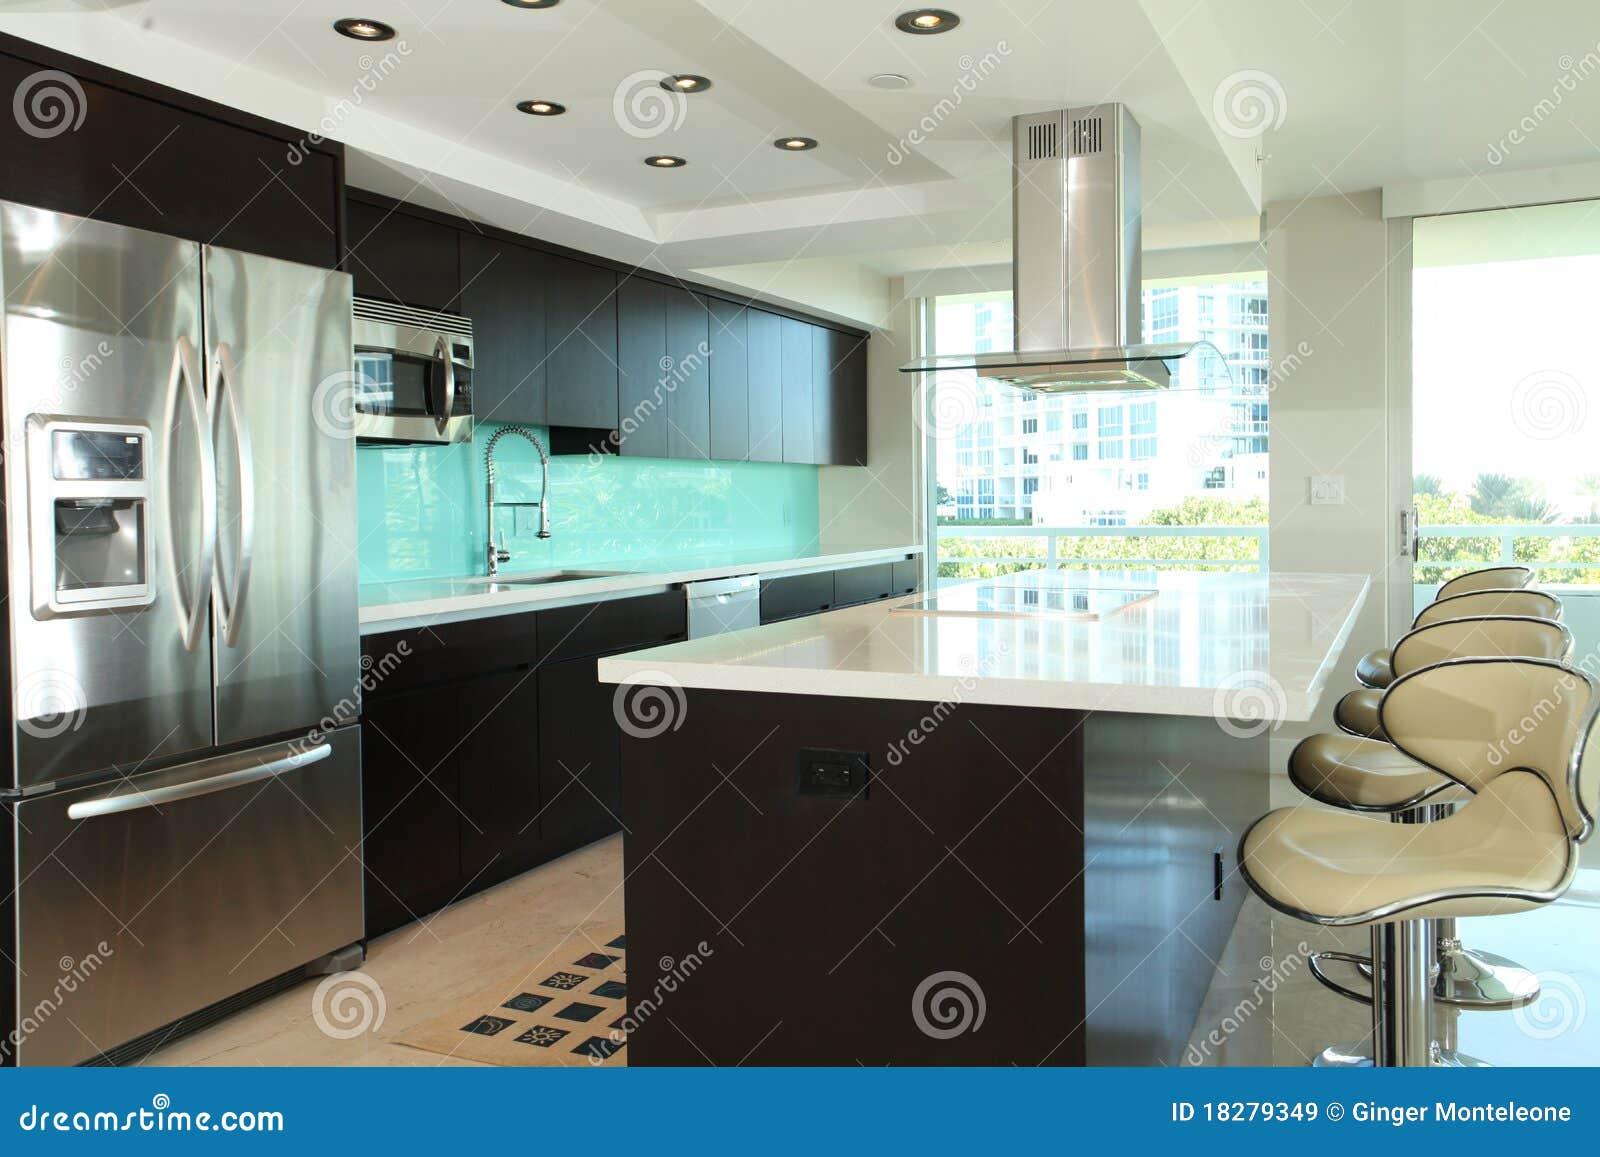 Idee open keuken for Moderne keuken ideeen